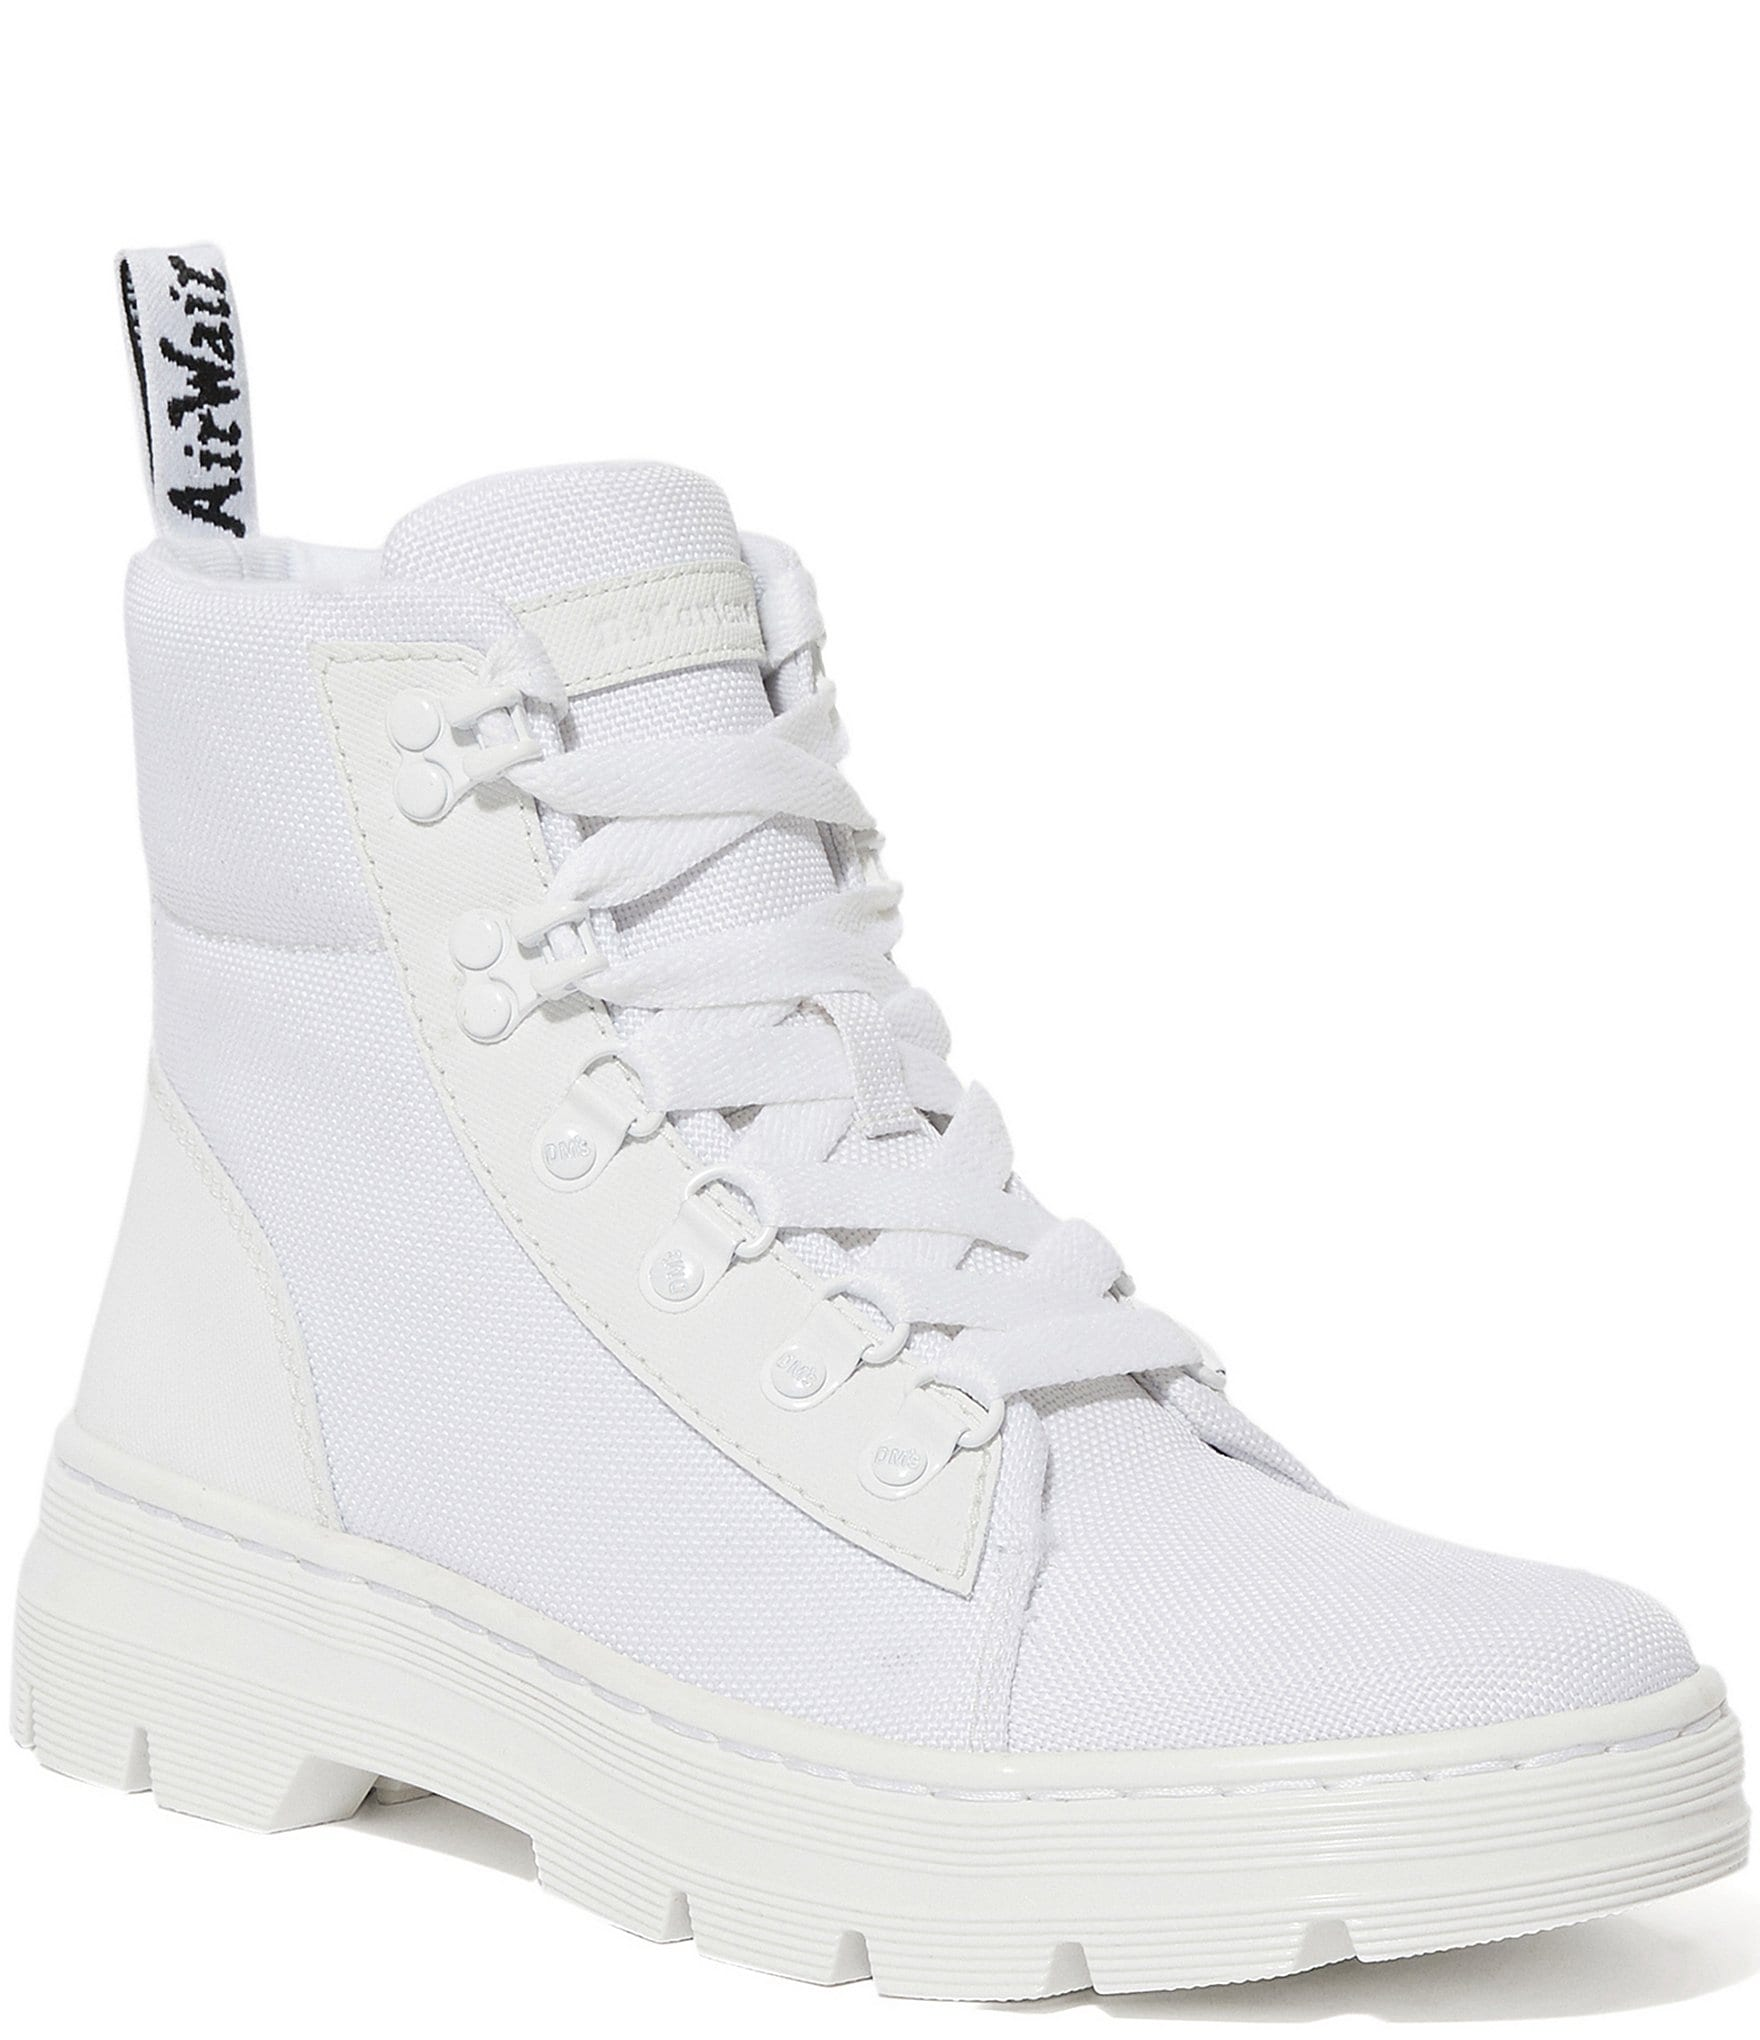 Combs Leather \u0026 Nylon Combat Boots